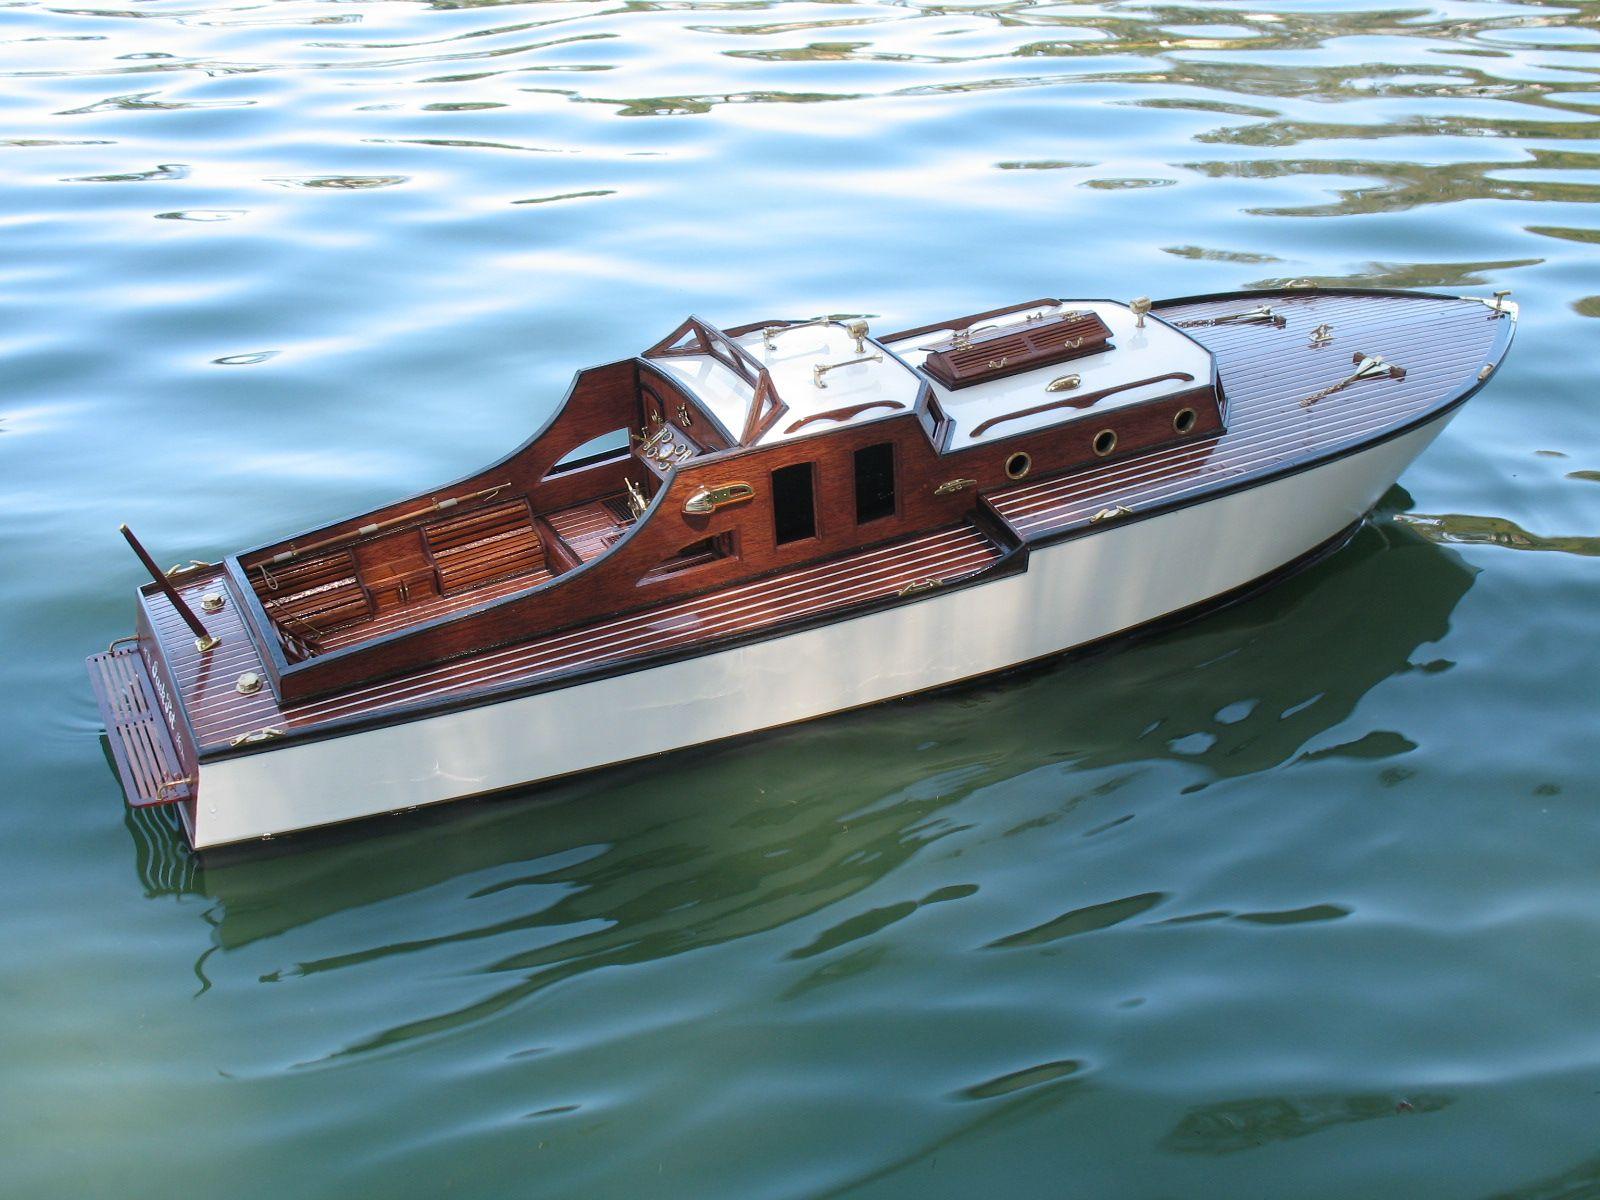 Cabin Cruiser | Vintage boats, Tug boats, Boat